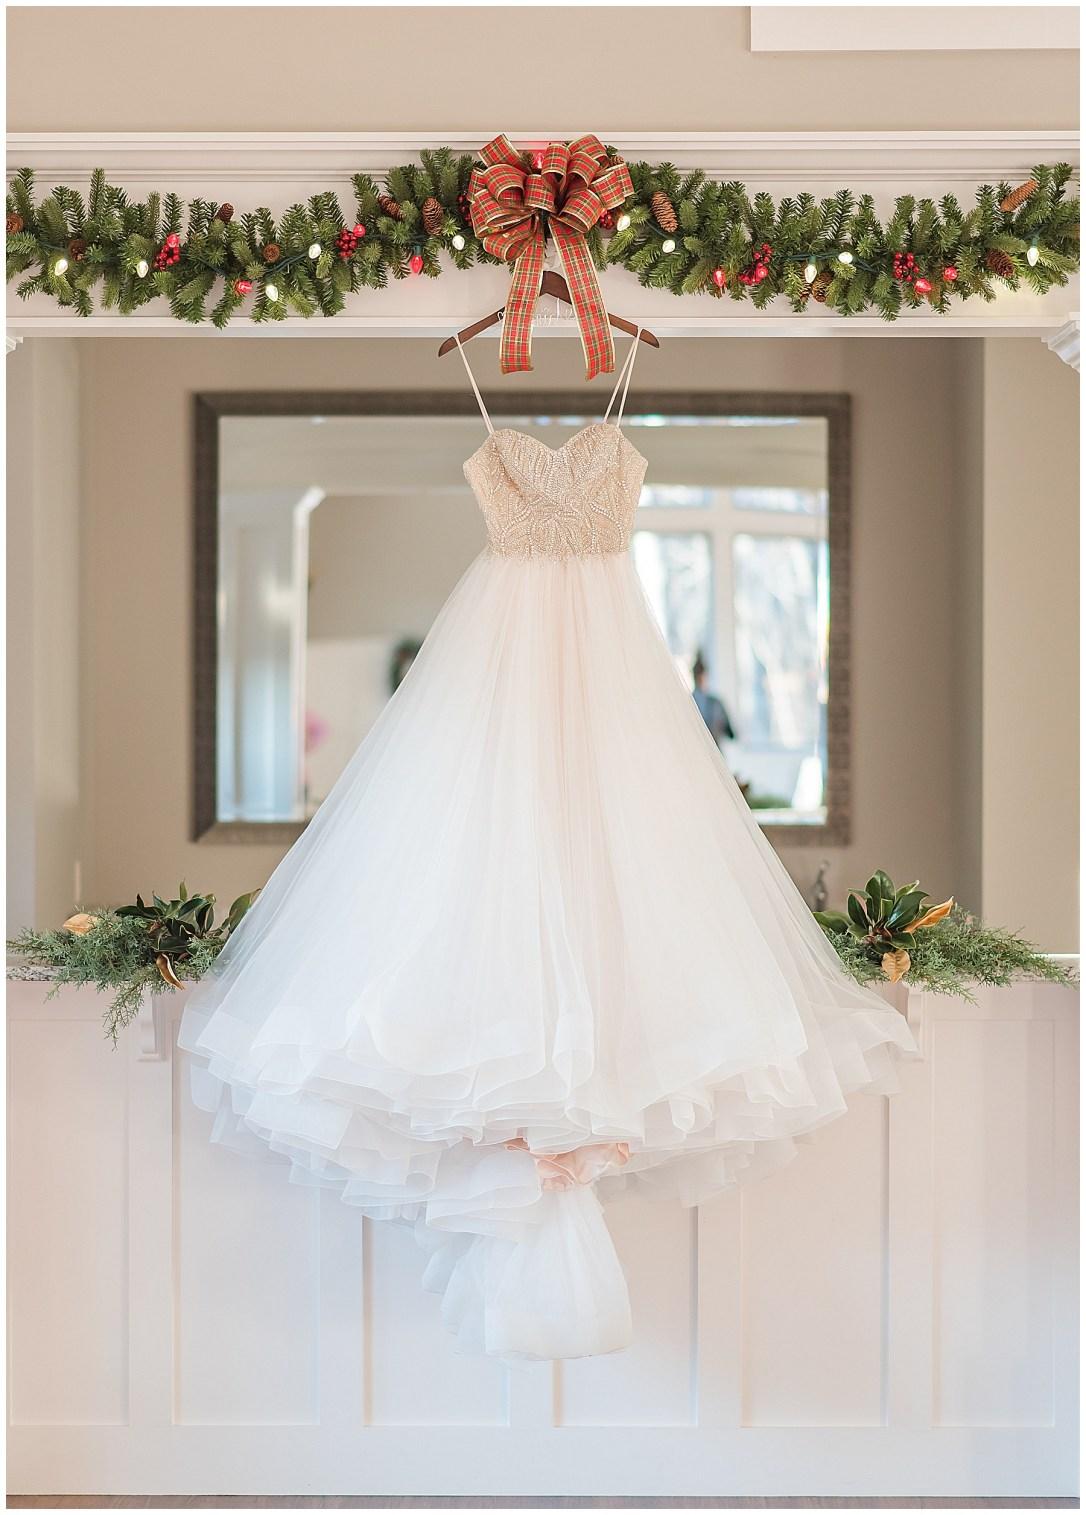 Mrs Bridal dress